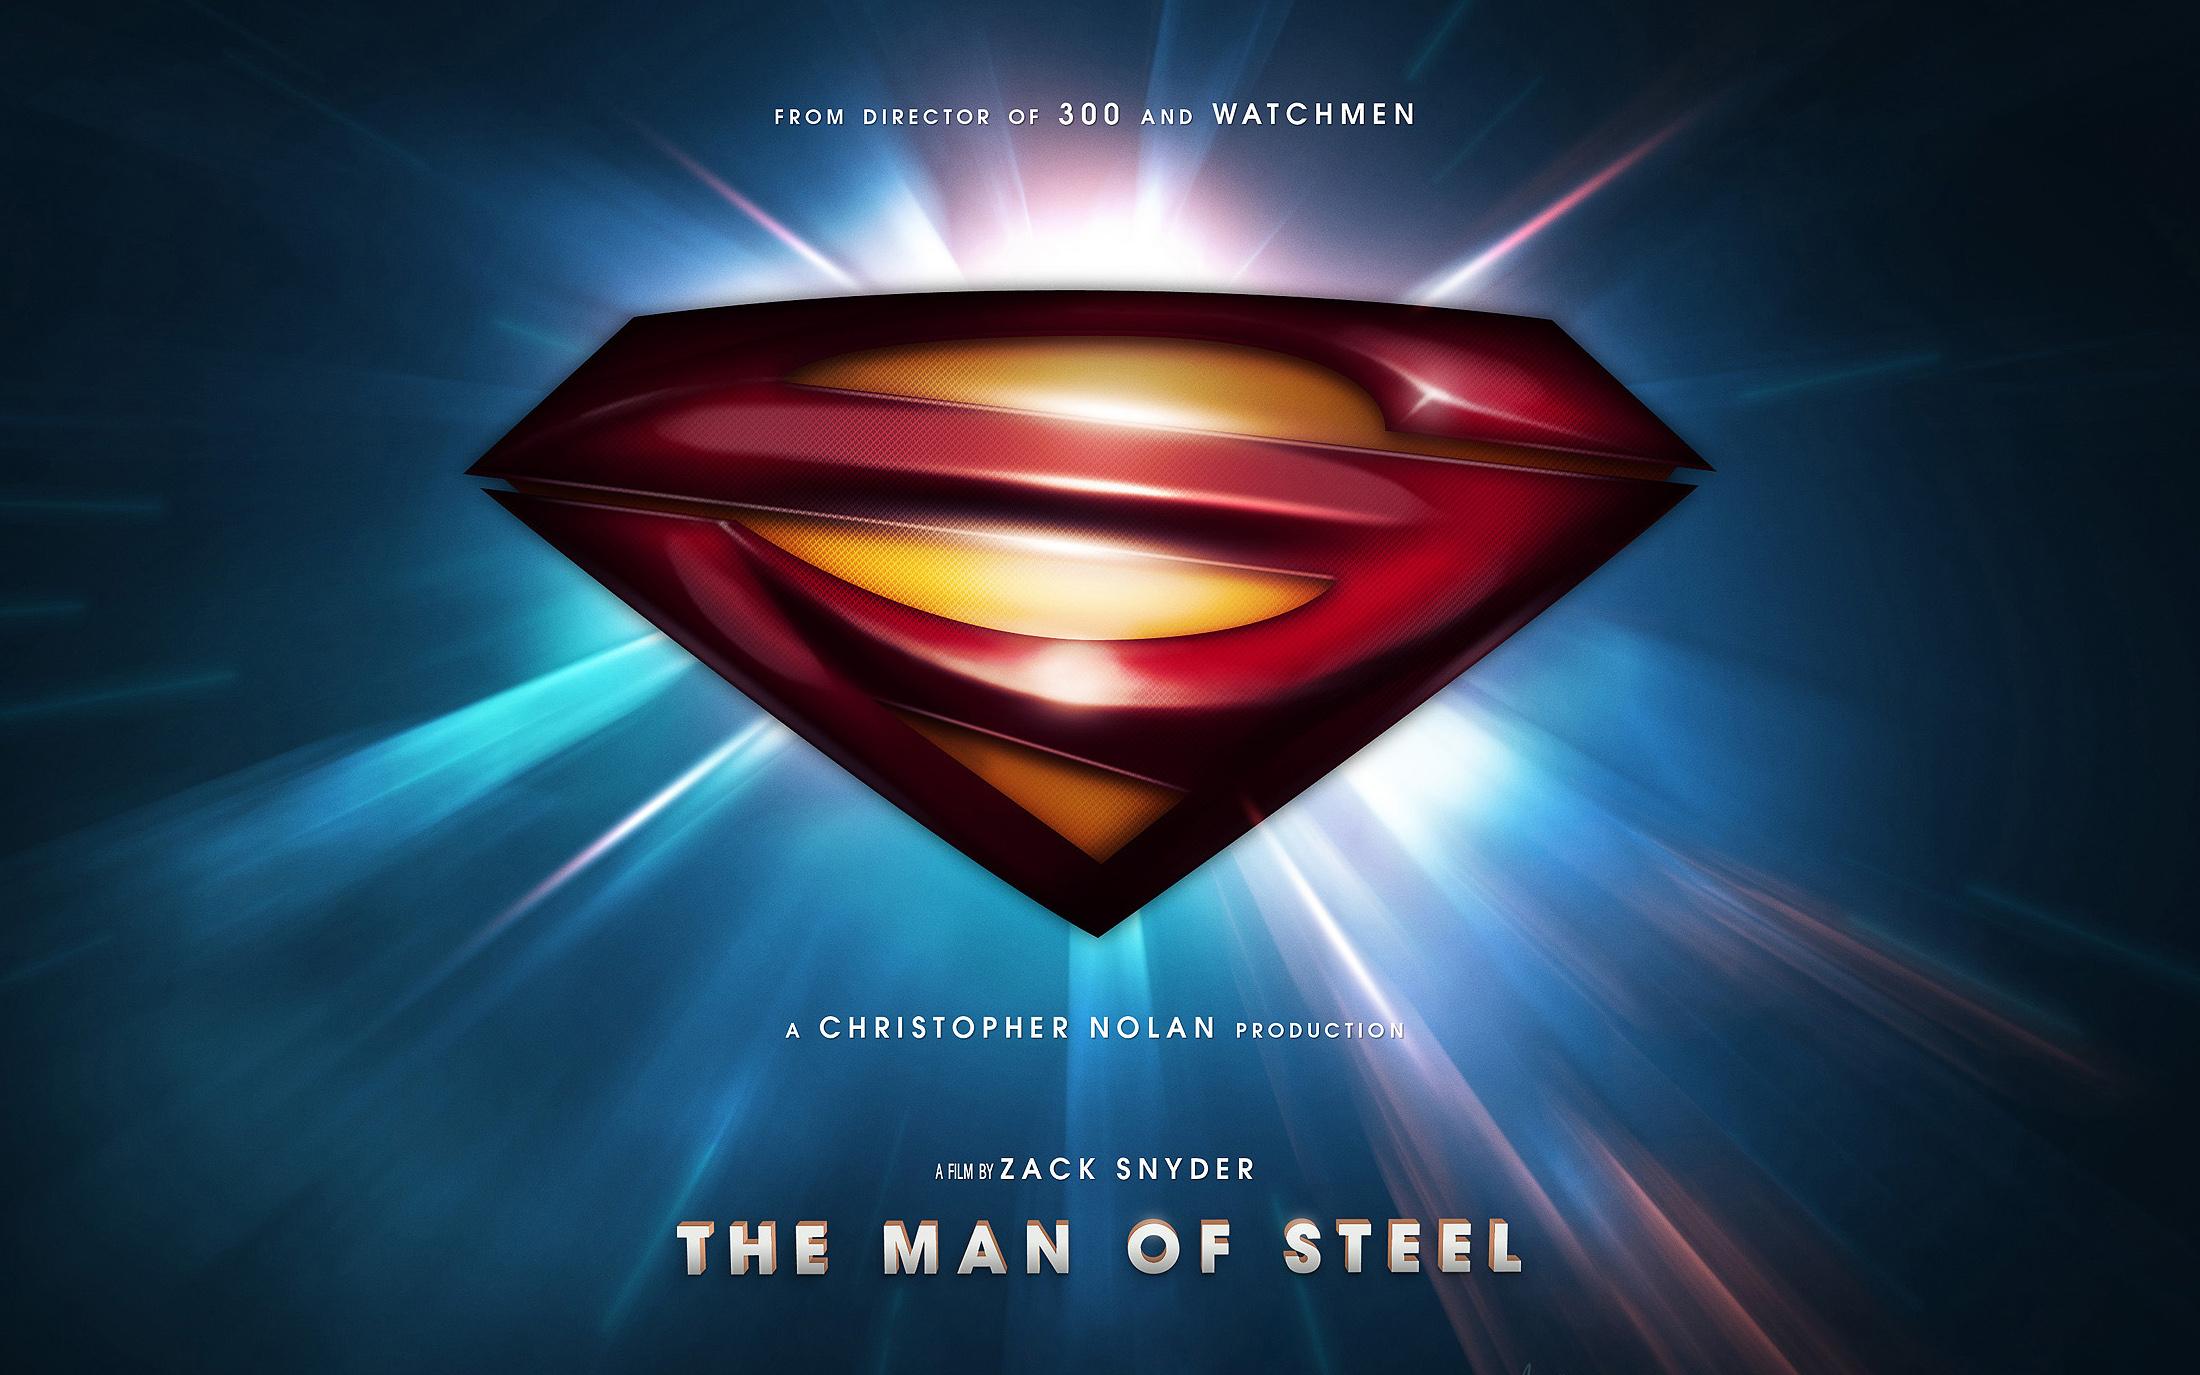 Superman Man of Steel 2013 wallpaper